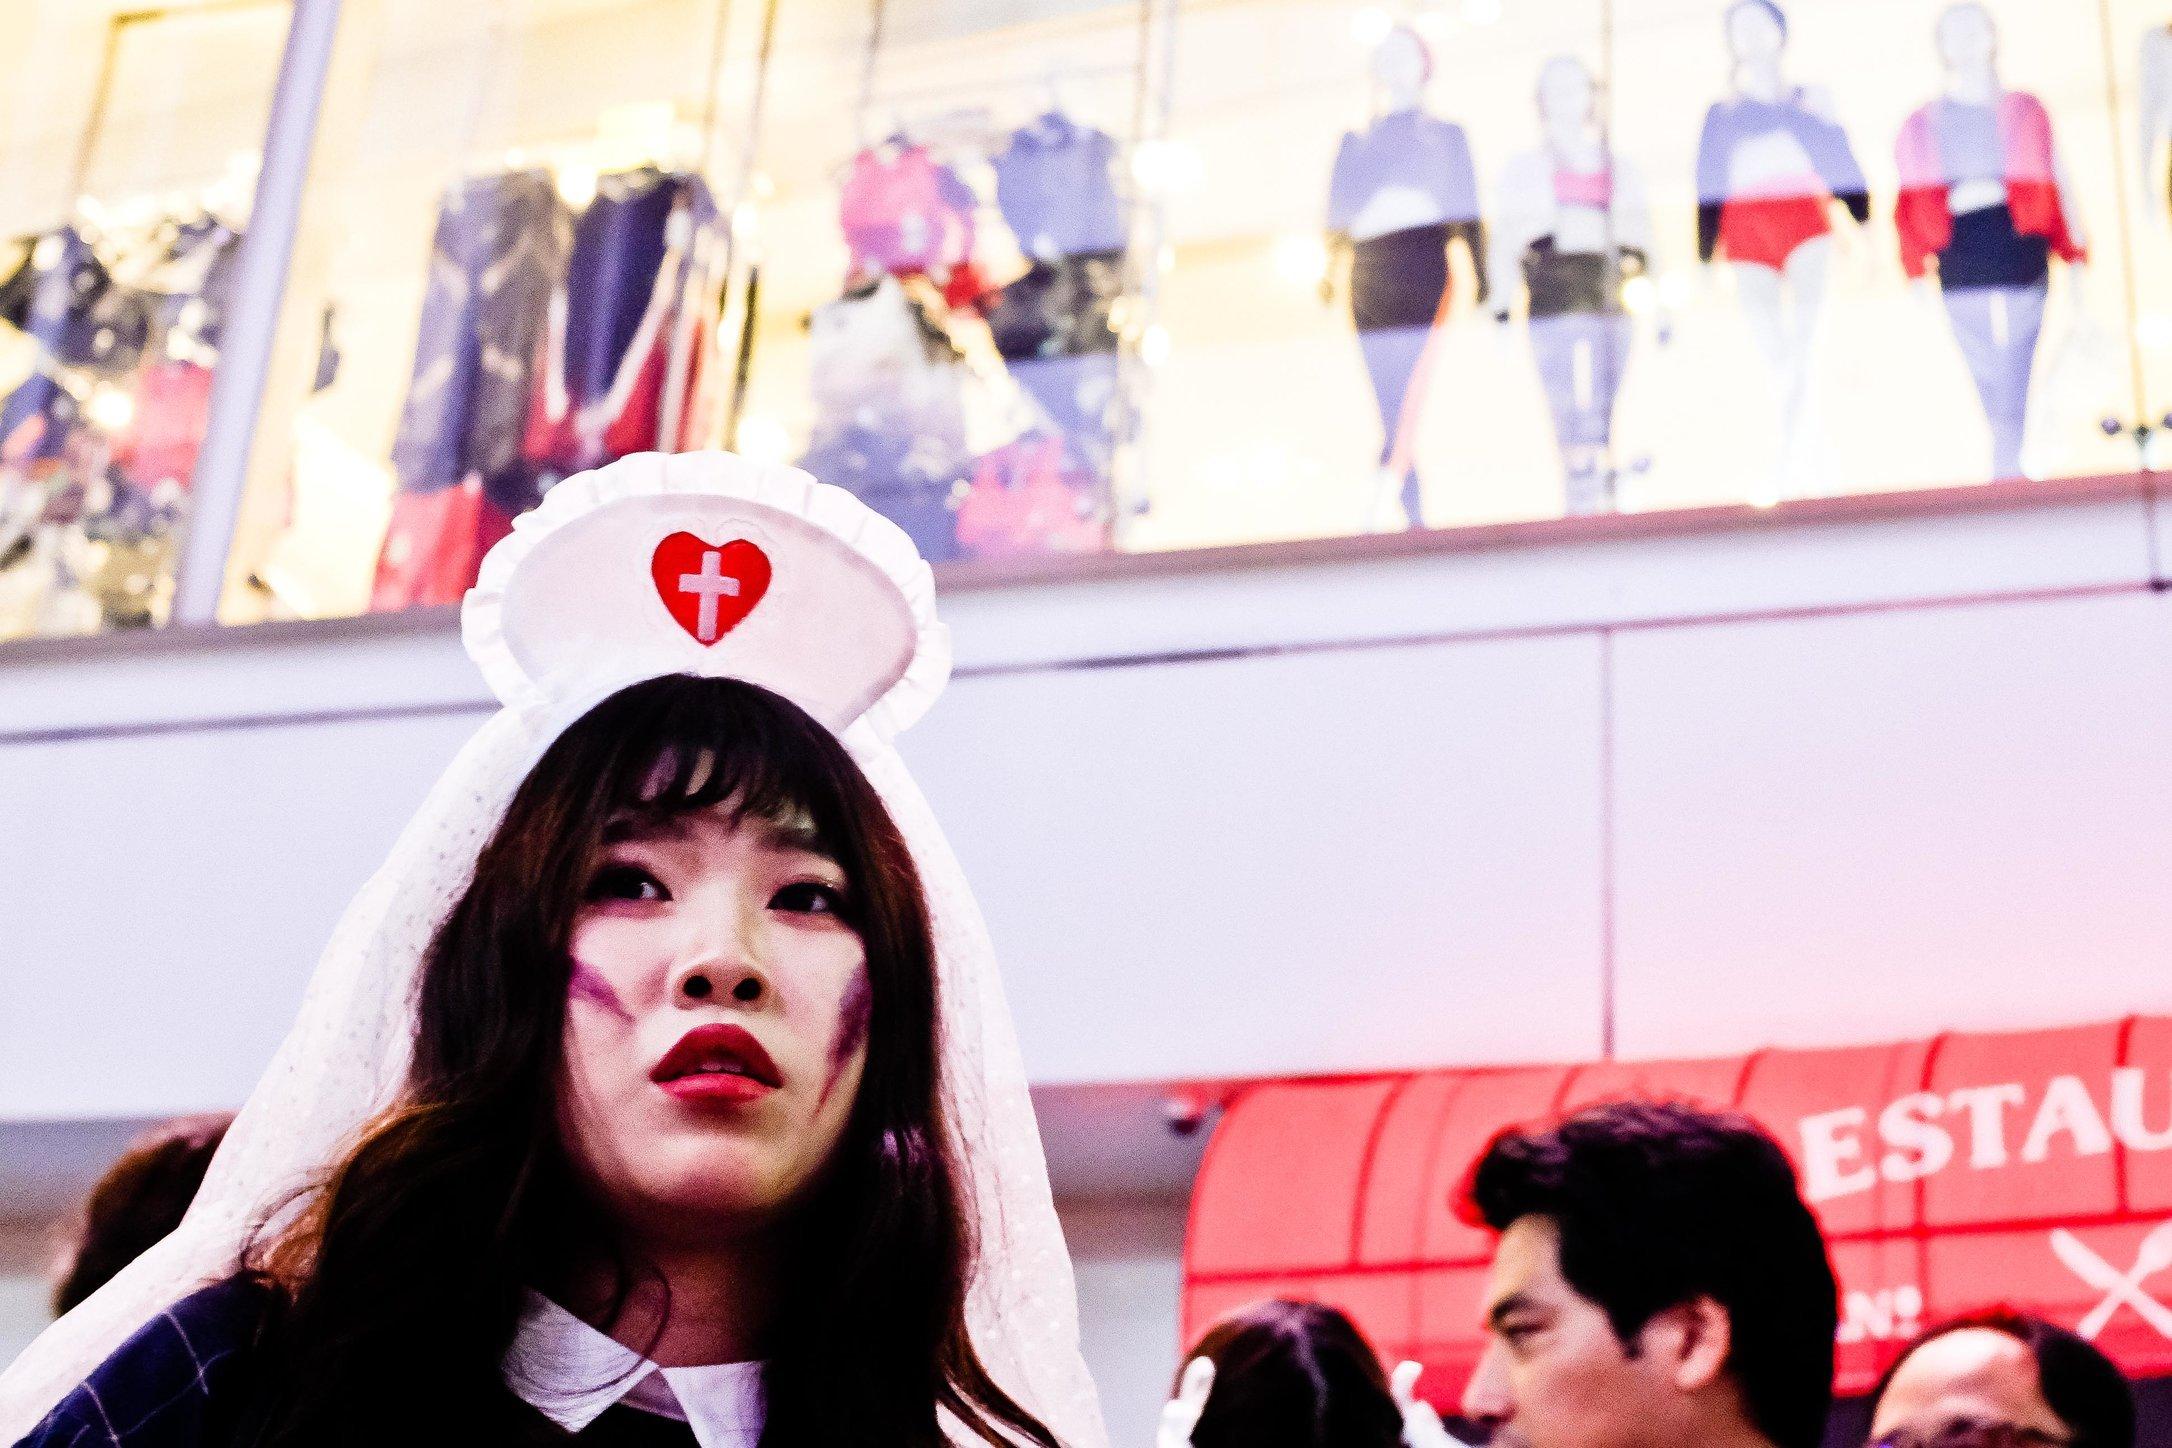 ShibuyaTimeWebsite-9.jpg